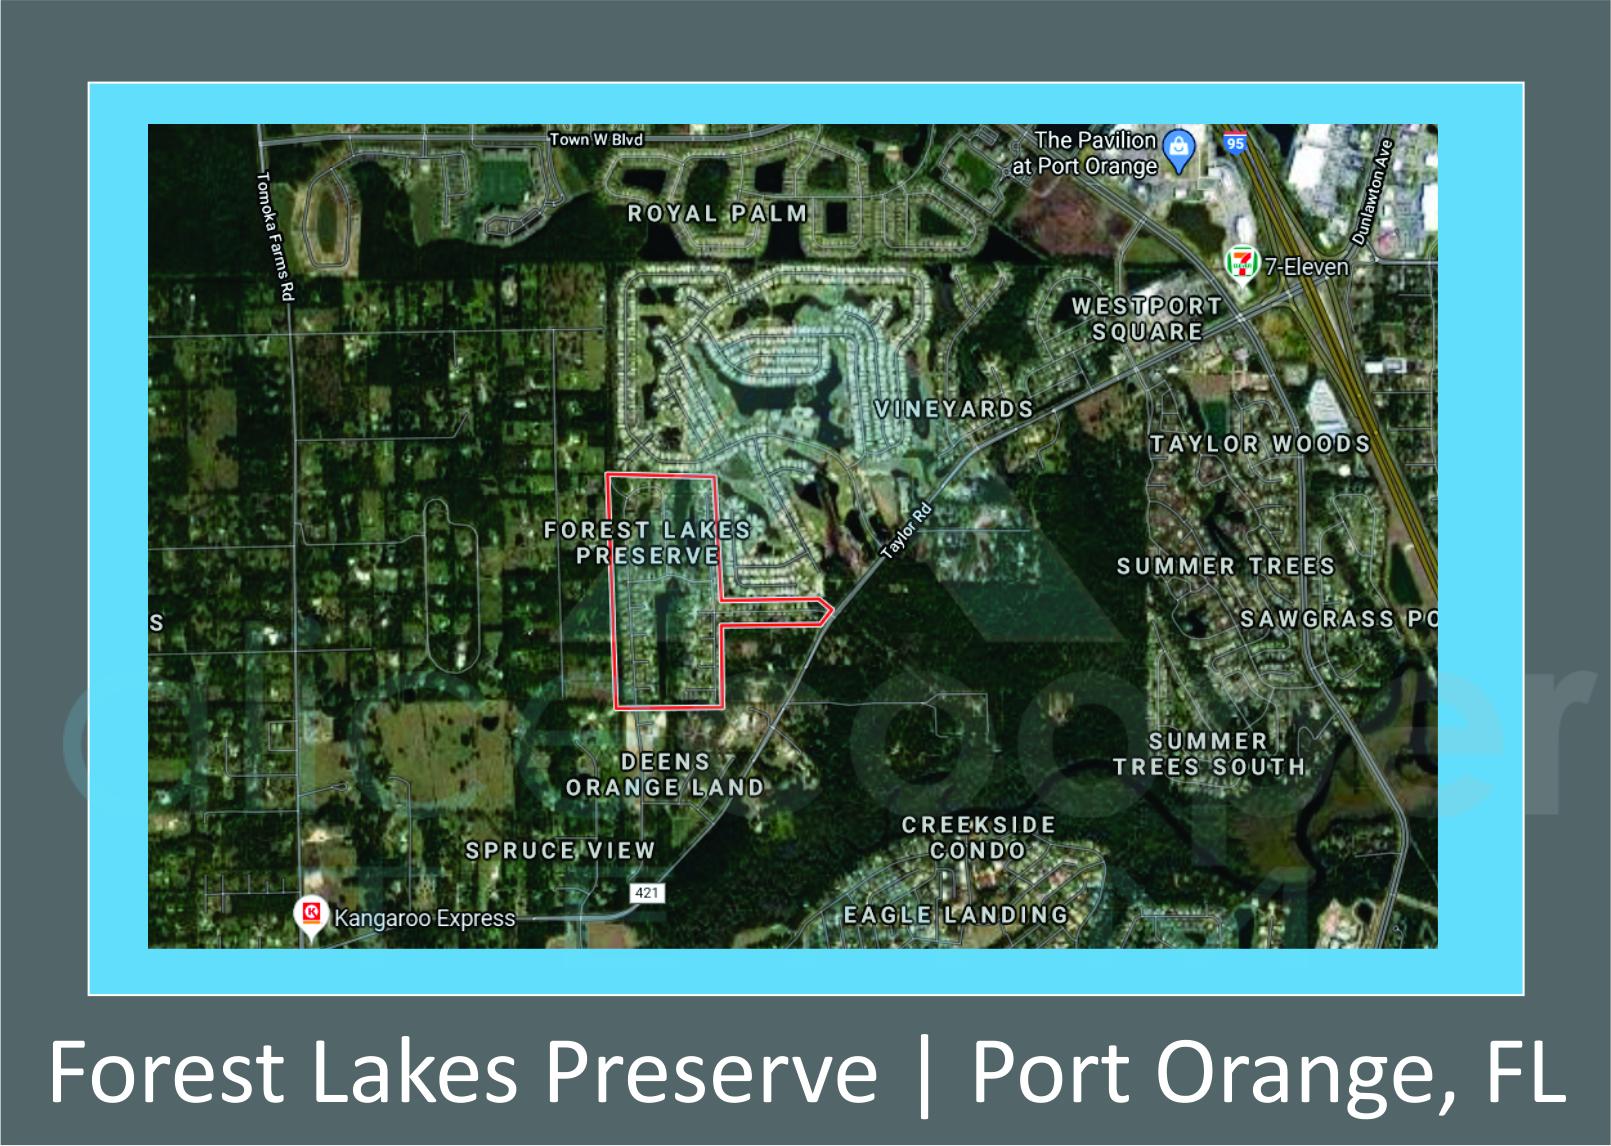 Map of Forest Lakes Preserve Port Orange, FL